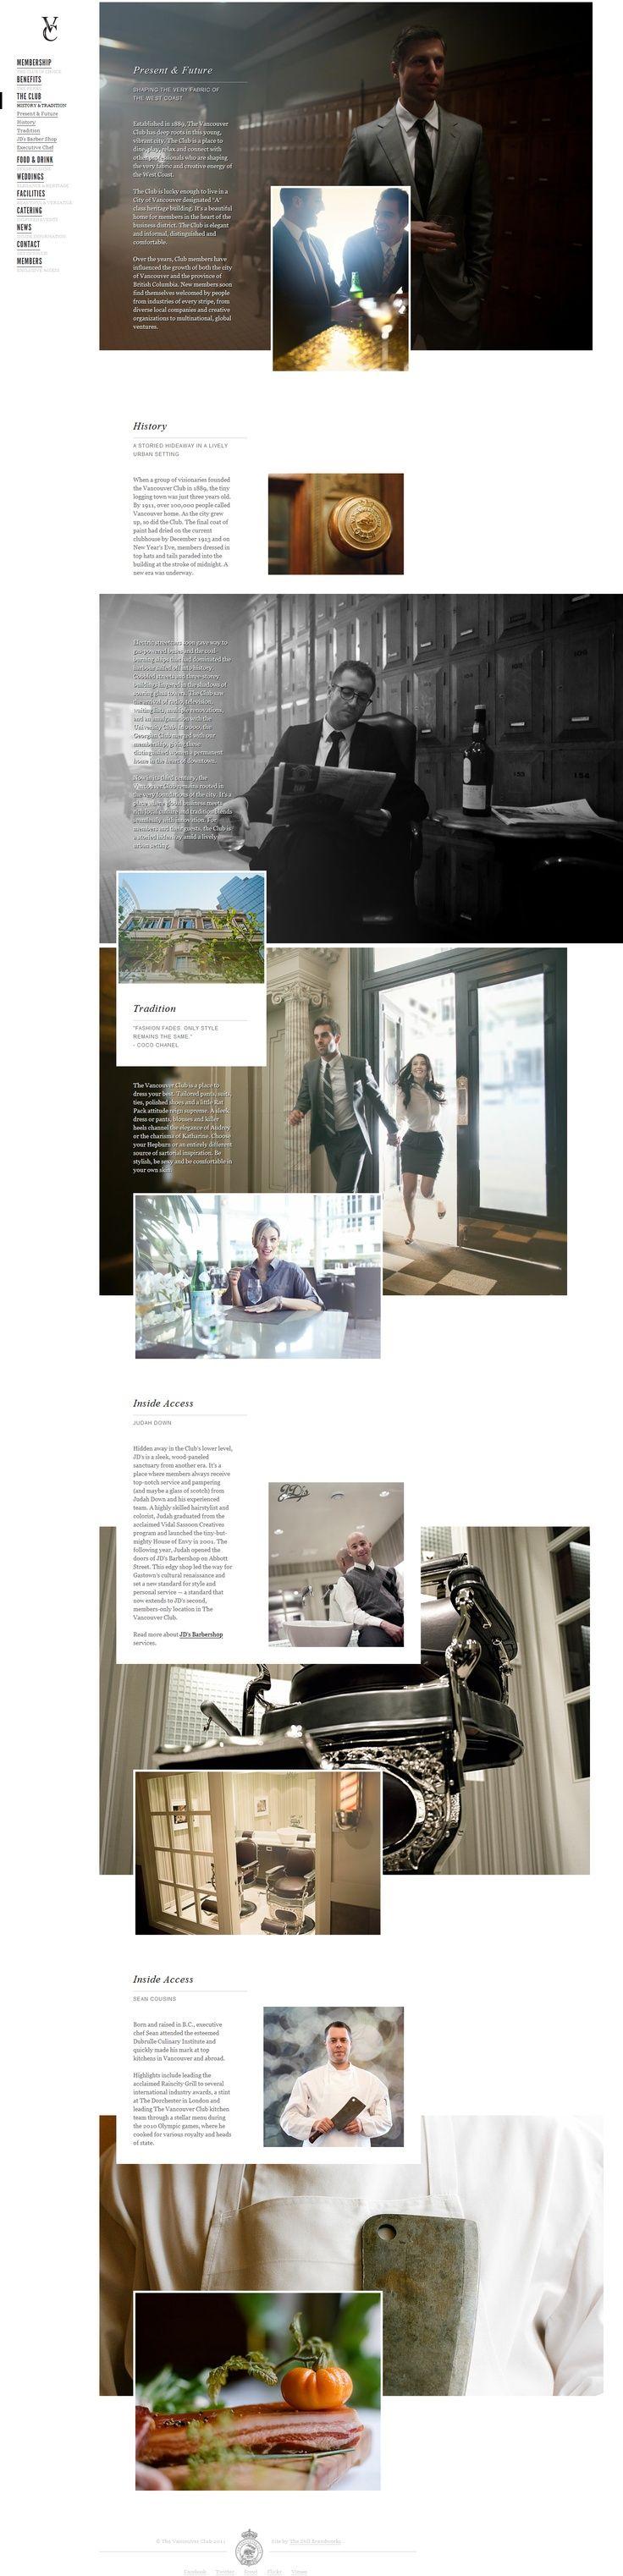 #photography #website | #webdesign #it #web #design #layout #userinterface #website #webdesign <<< repinned by an #advertising #agency from #Hamburg / #Germany - www.BlickeDeeler.de